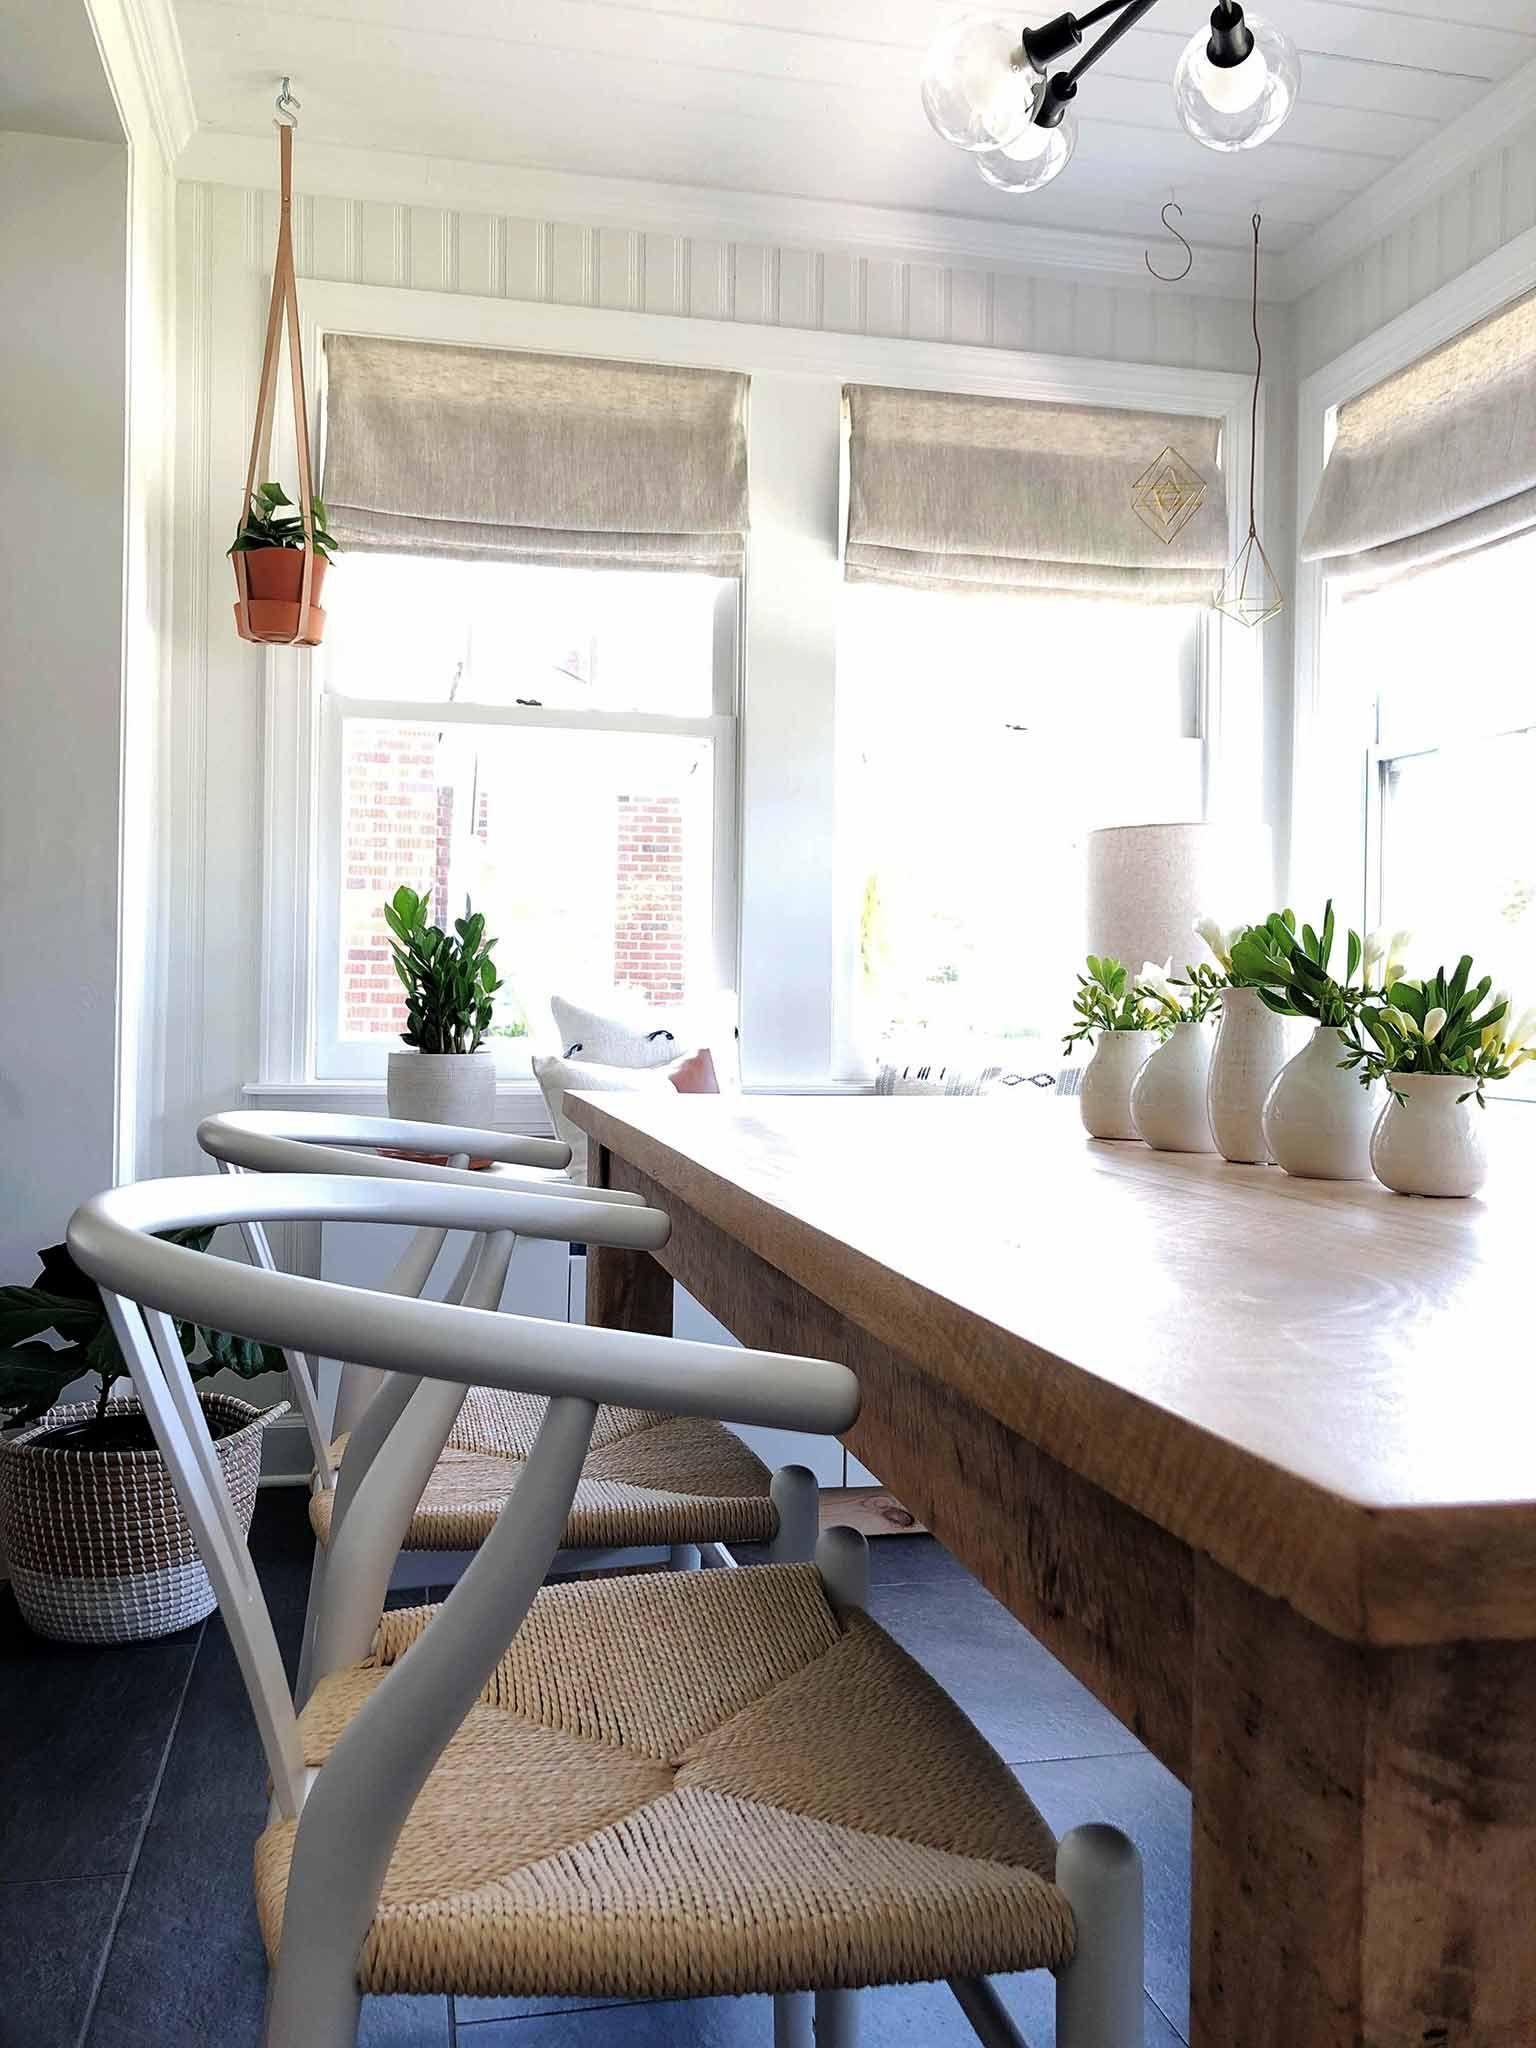 Dining Room & Entryway - Guest Participant of the One Room Challenge   That Homebird Life Blog   #oneroomchallenge #diningroom #interiorinspiration #diningroomdecor